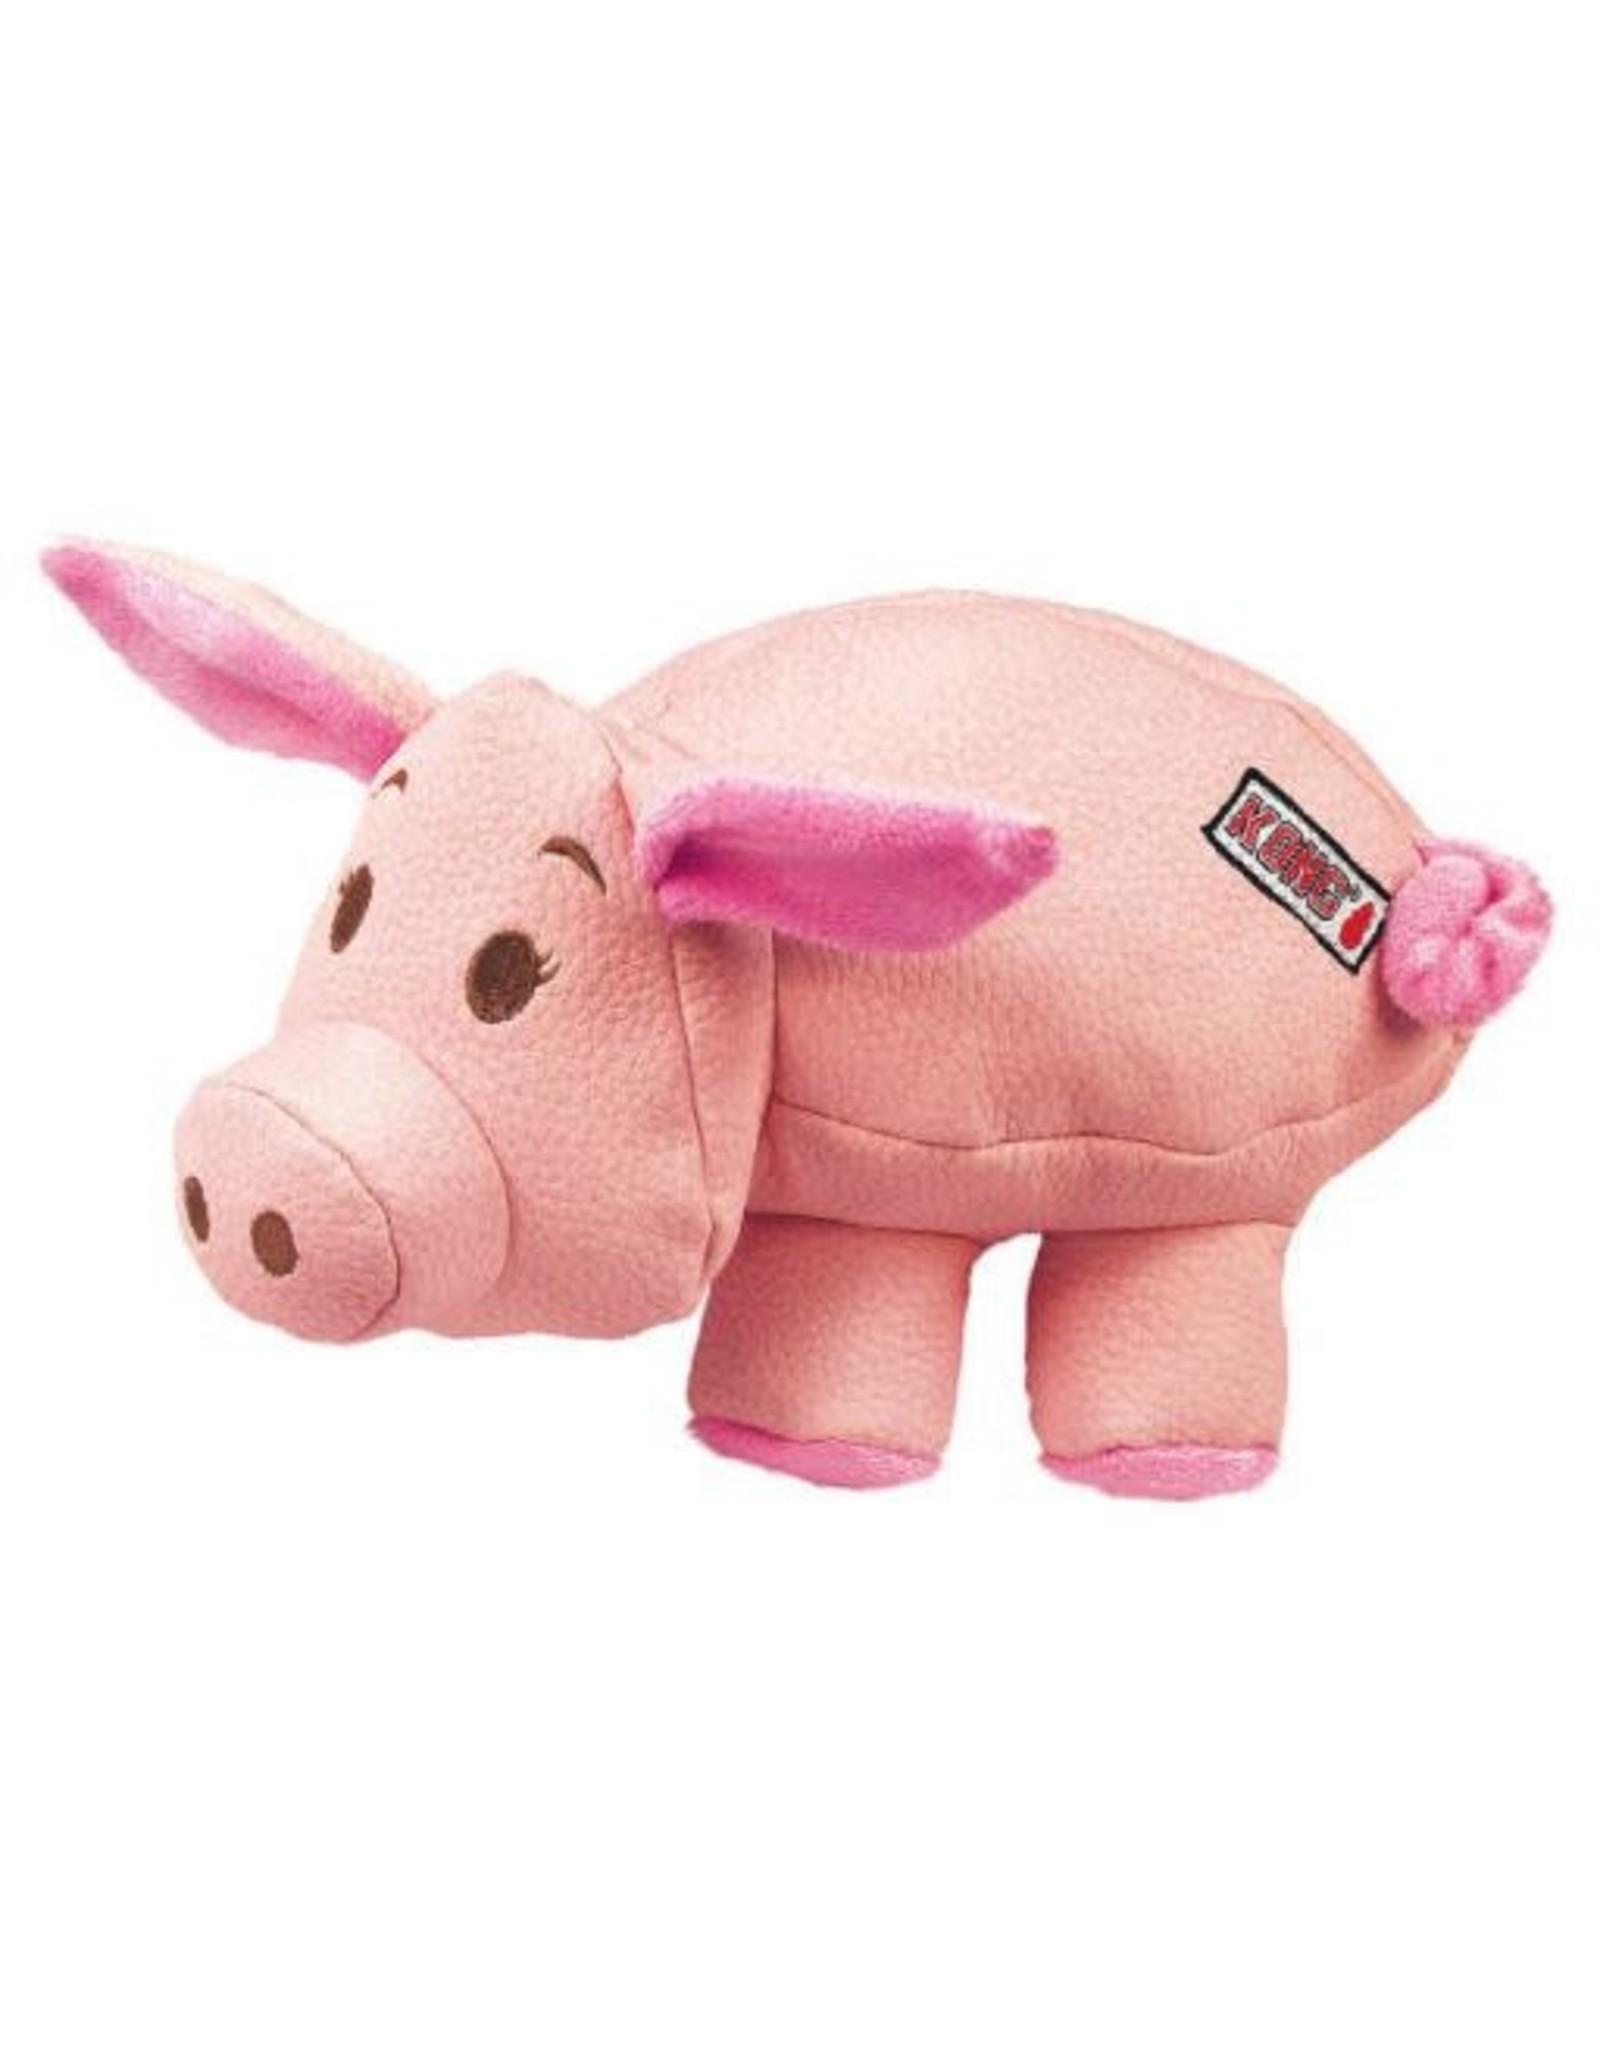 KONG Dog Toy - Phatz Pig M